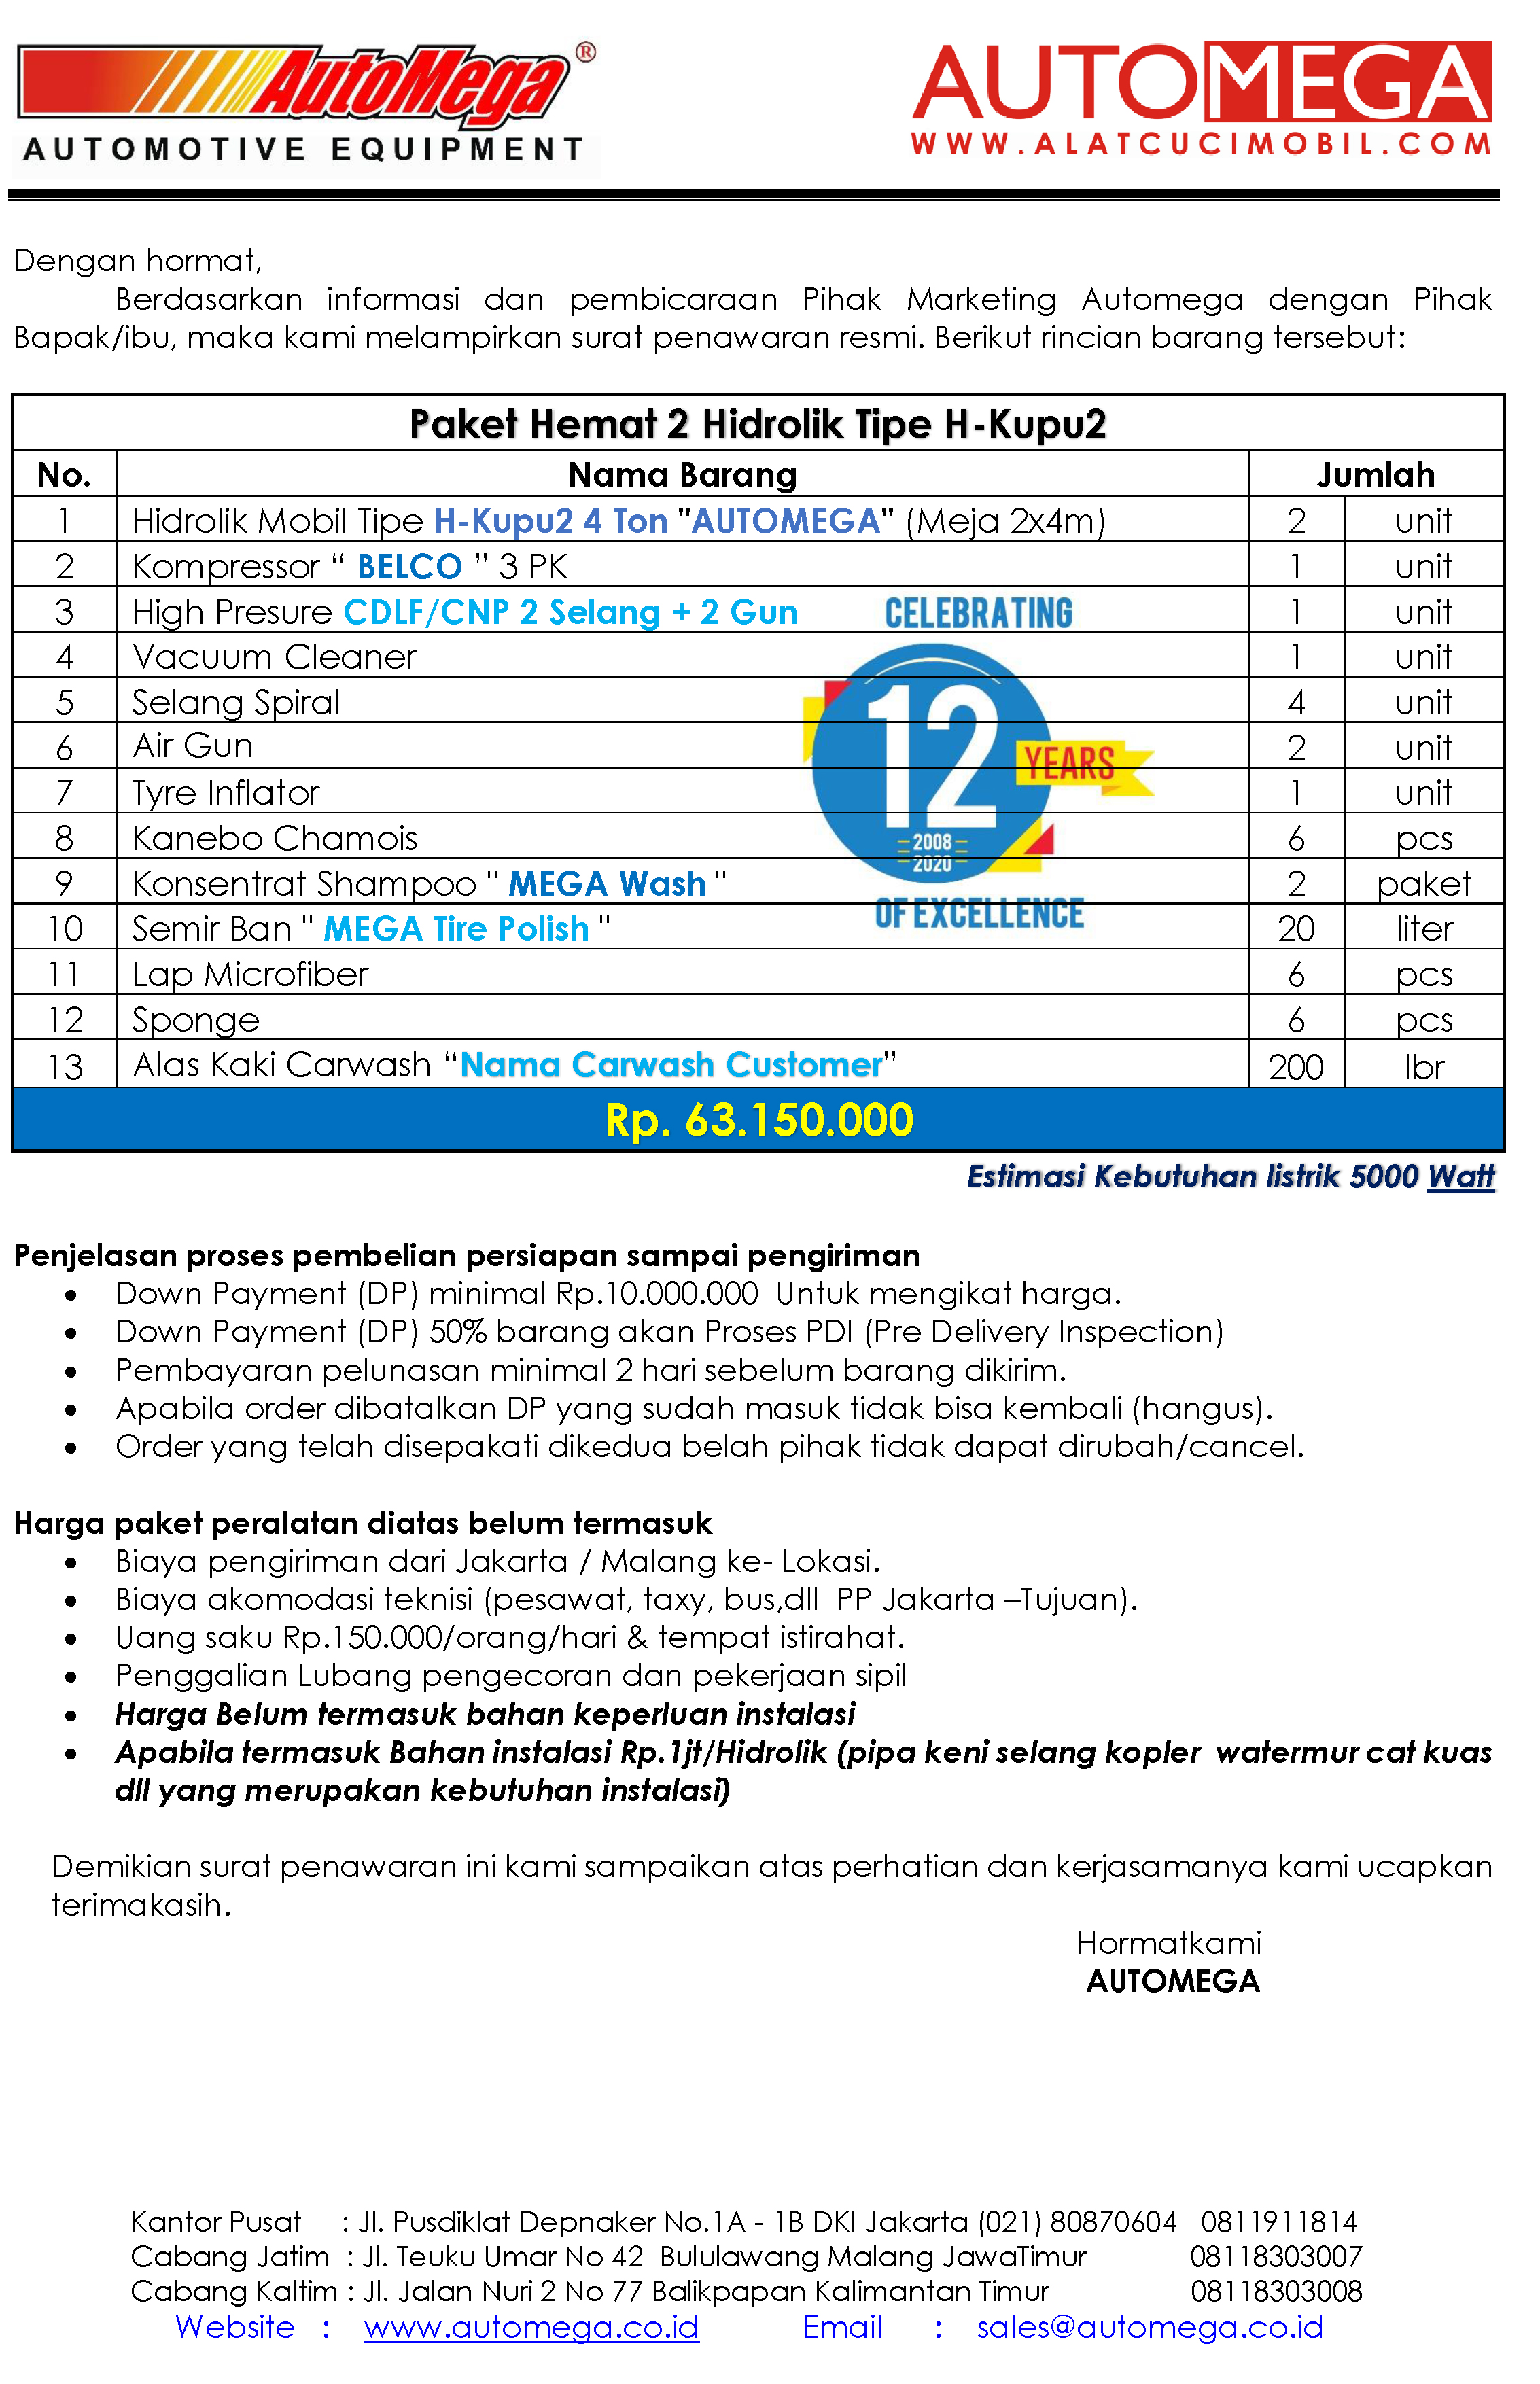 Paket Hemat 2 Hidrolik Lift Cuci Mobil tipe H-Kupu2